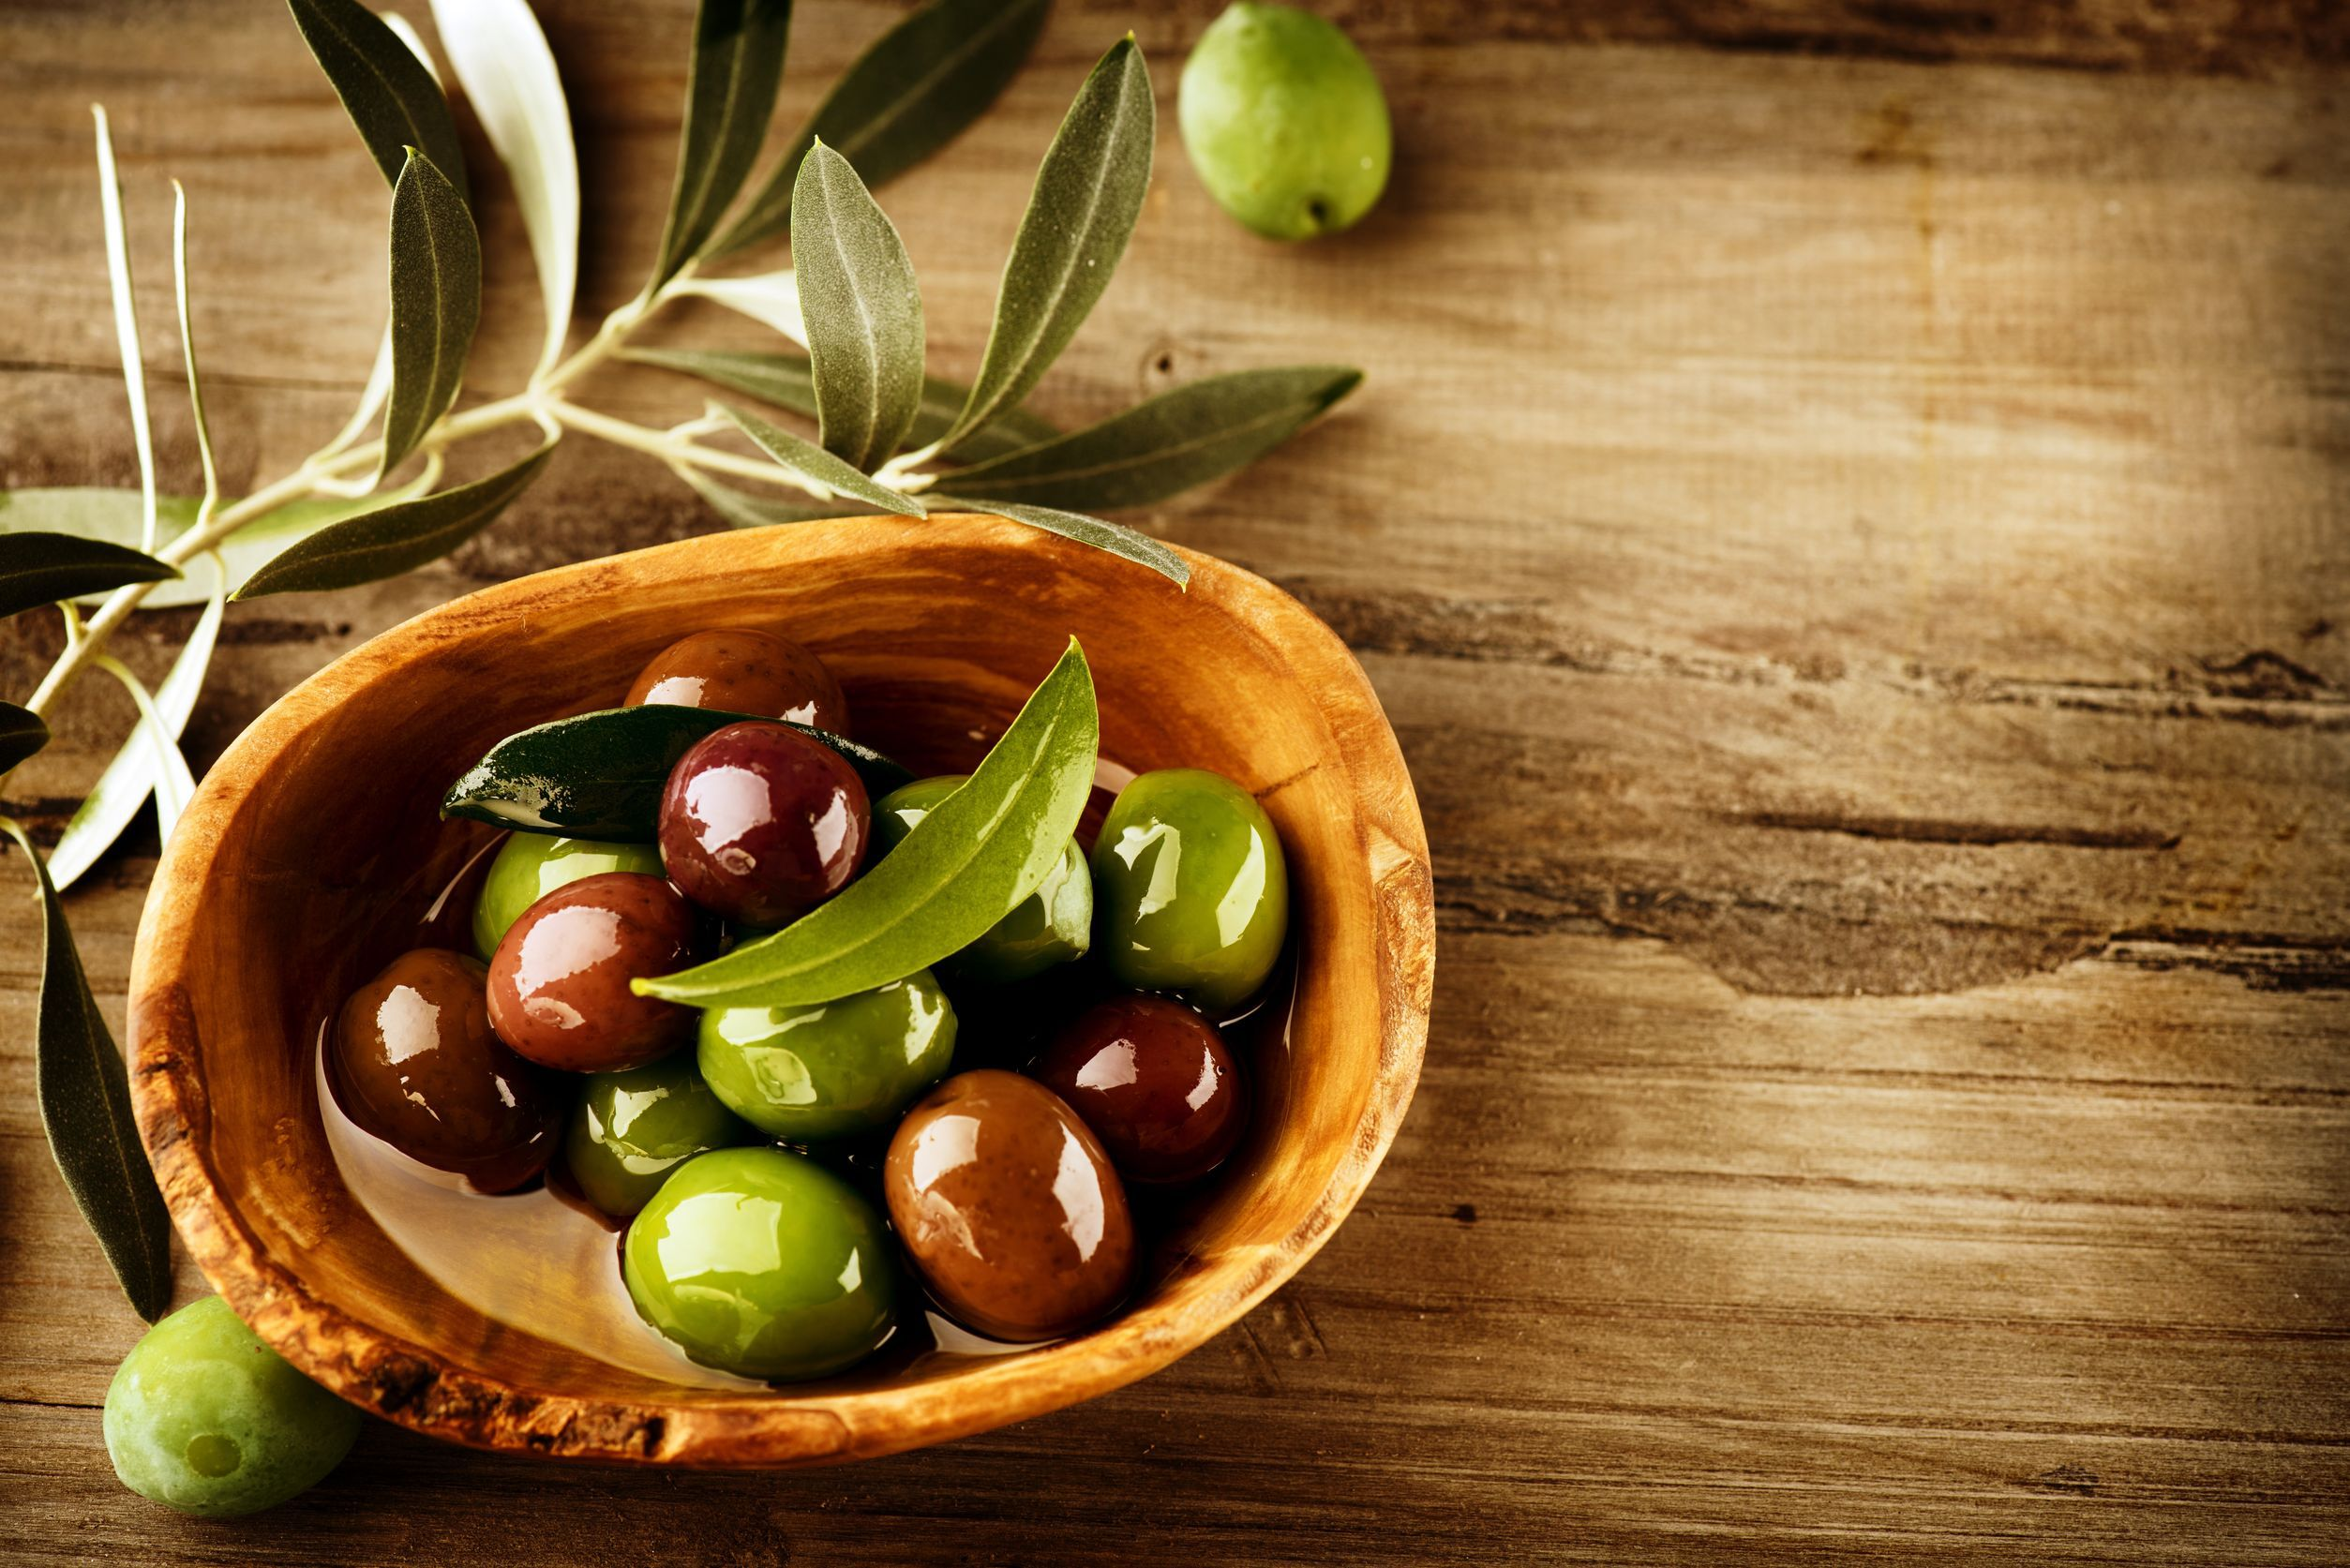 Olive HD Wallpaper